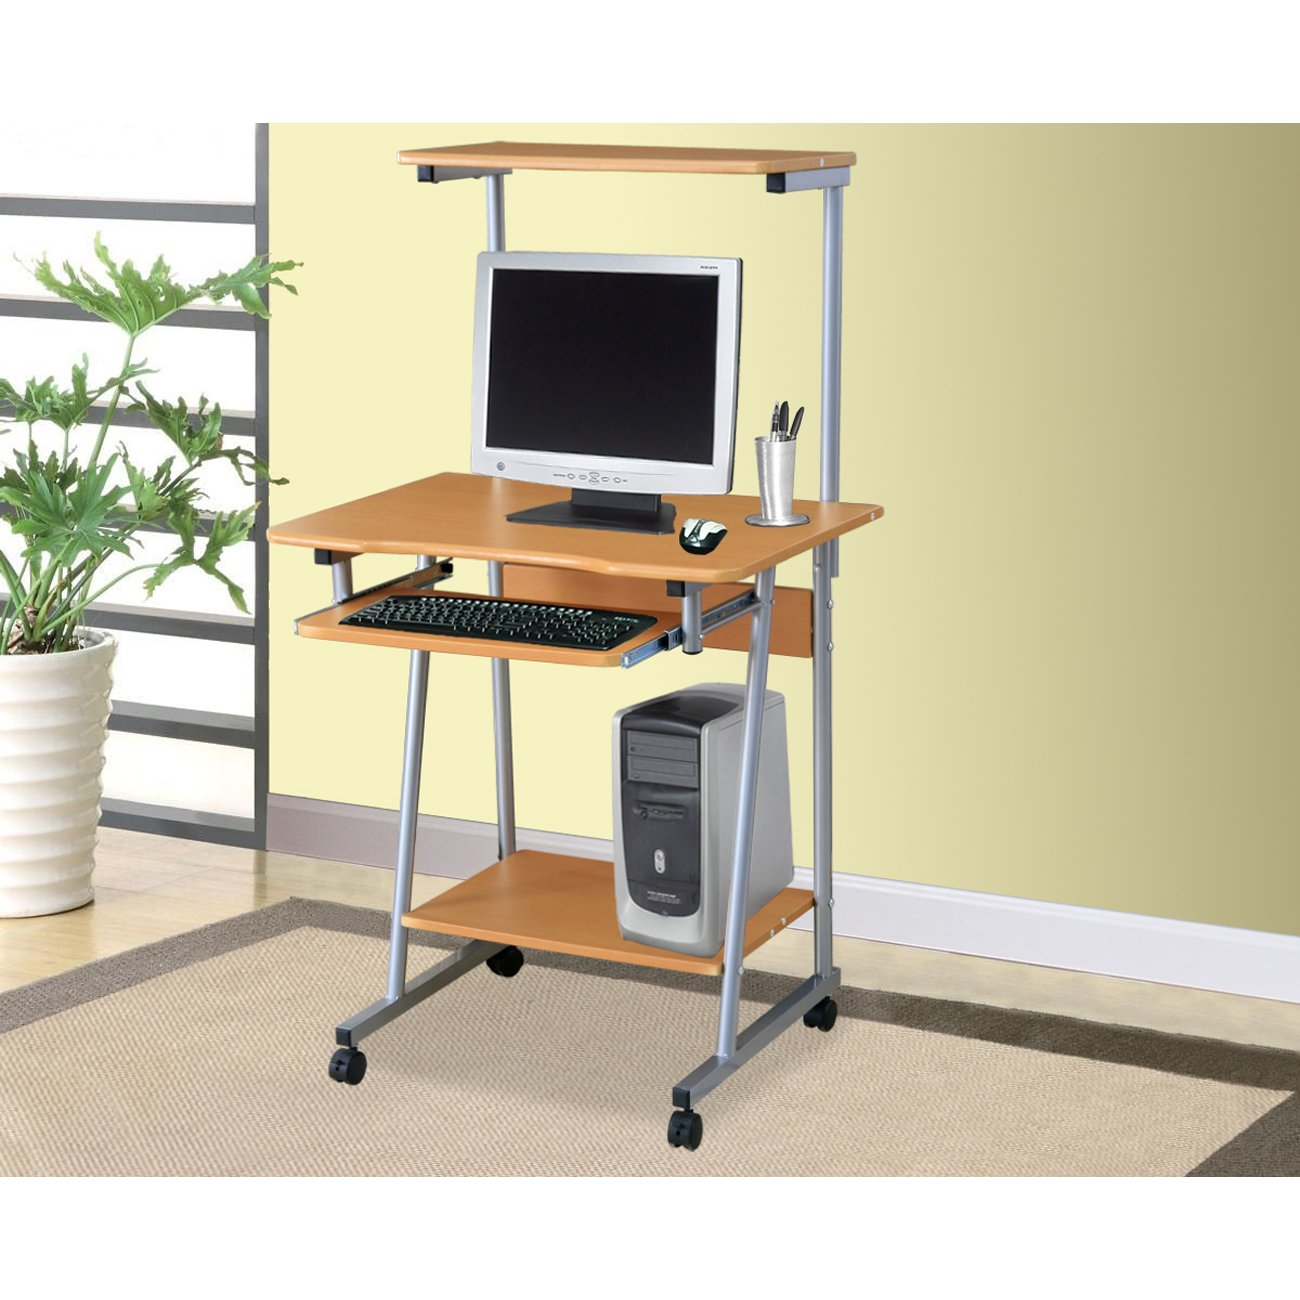 Home Source Johnson Cherrry Computer Cart with Upper Shelf